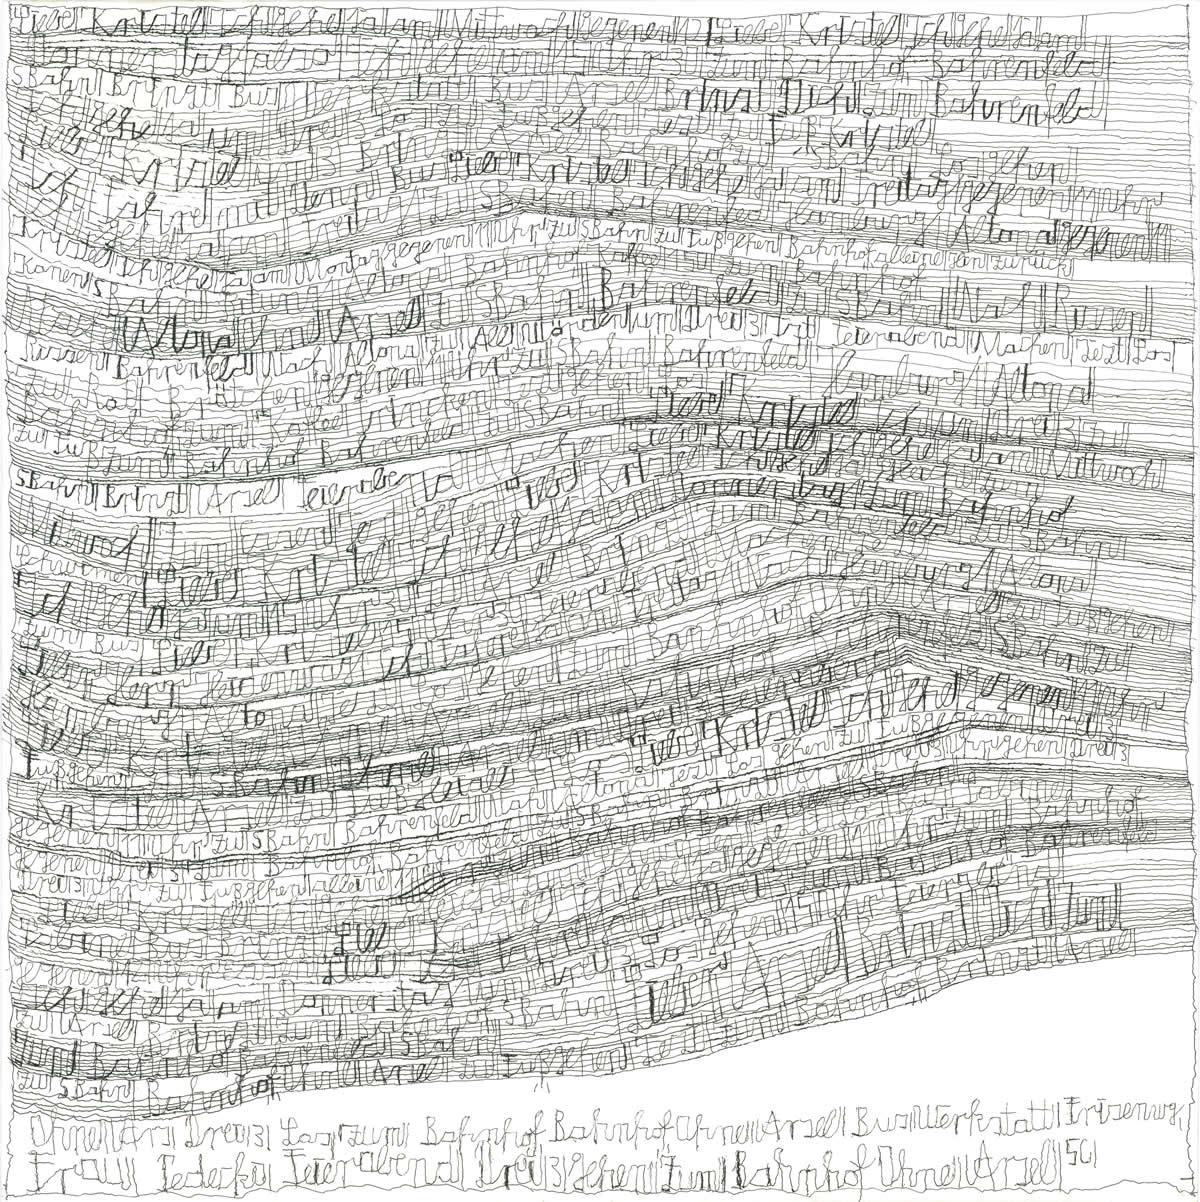 Harald Stoffers | Brief205 2011 | 55x55cm | viennacontemporary | Galerie3